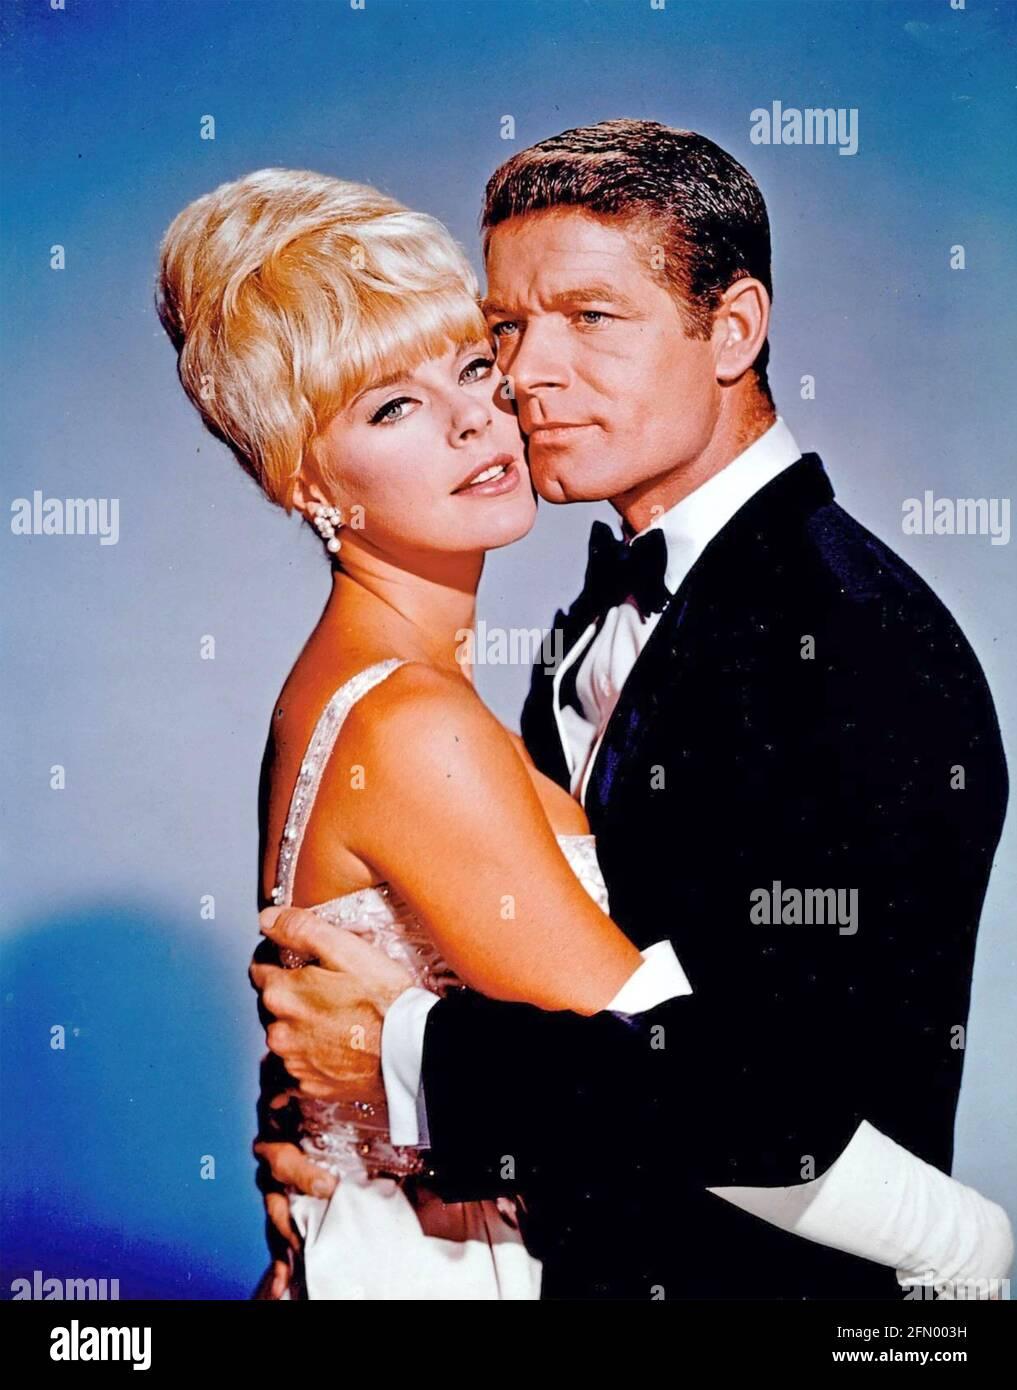 LE FILM OSCAR 1966 Embassy Pictures avec Stephen Boyd AS La star de cinéma Frankie Fane et Elke Sommer en tant que designer de mode Kay Bergdahl Banque D'Images